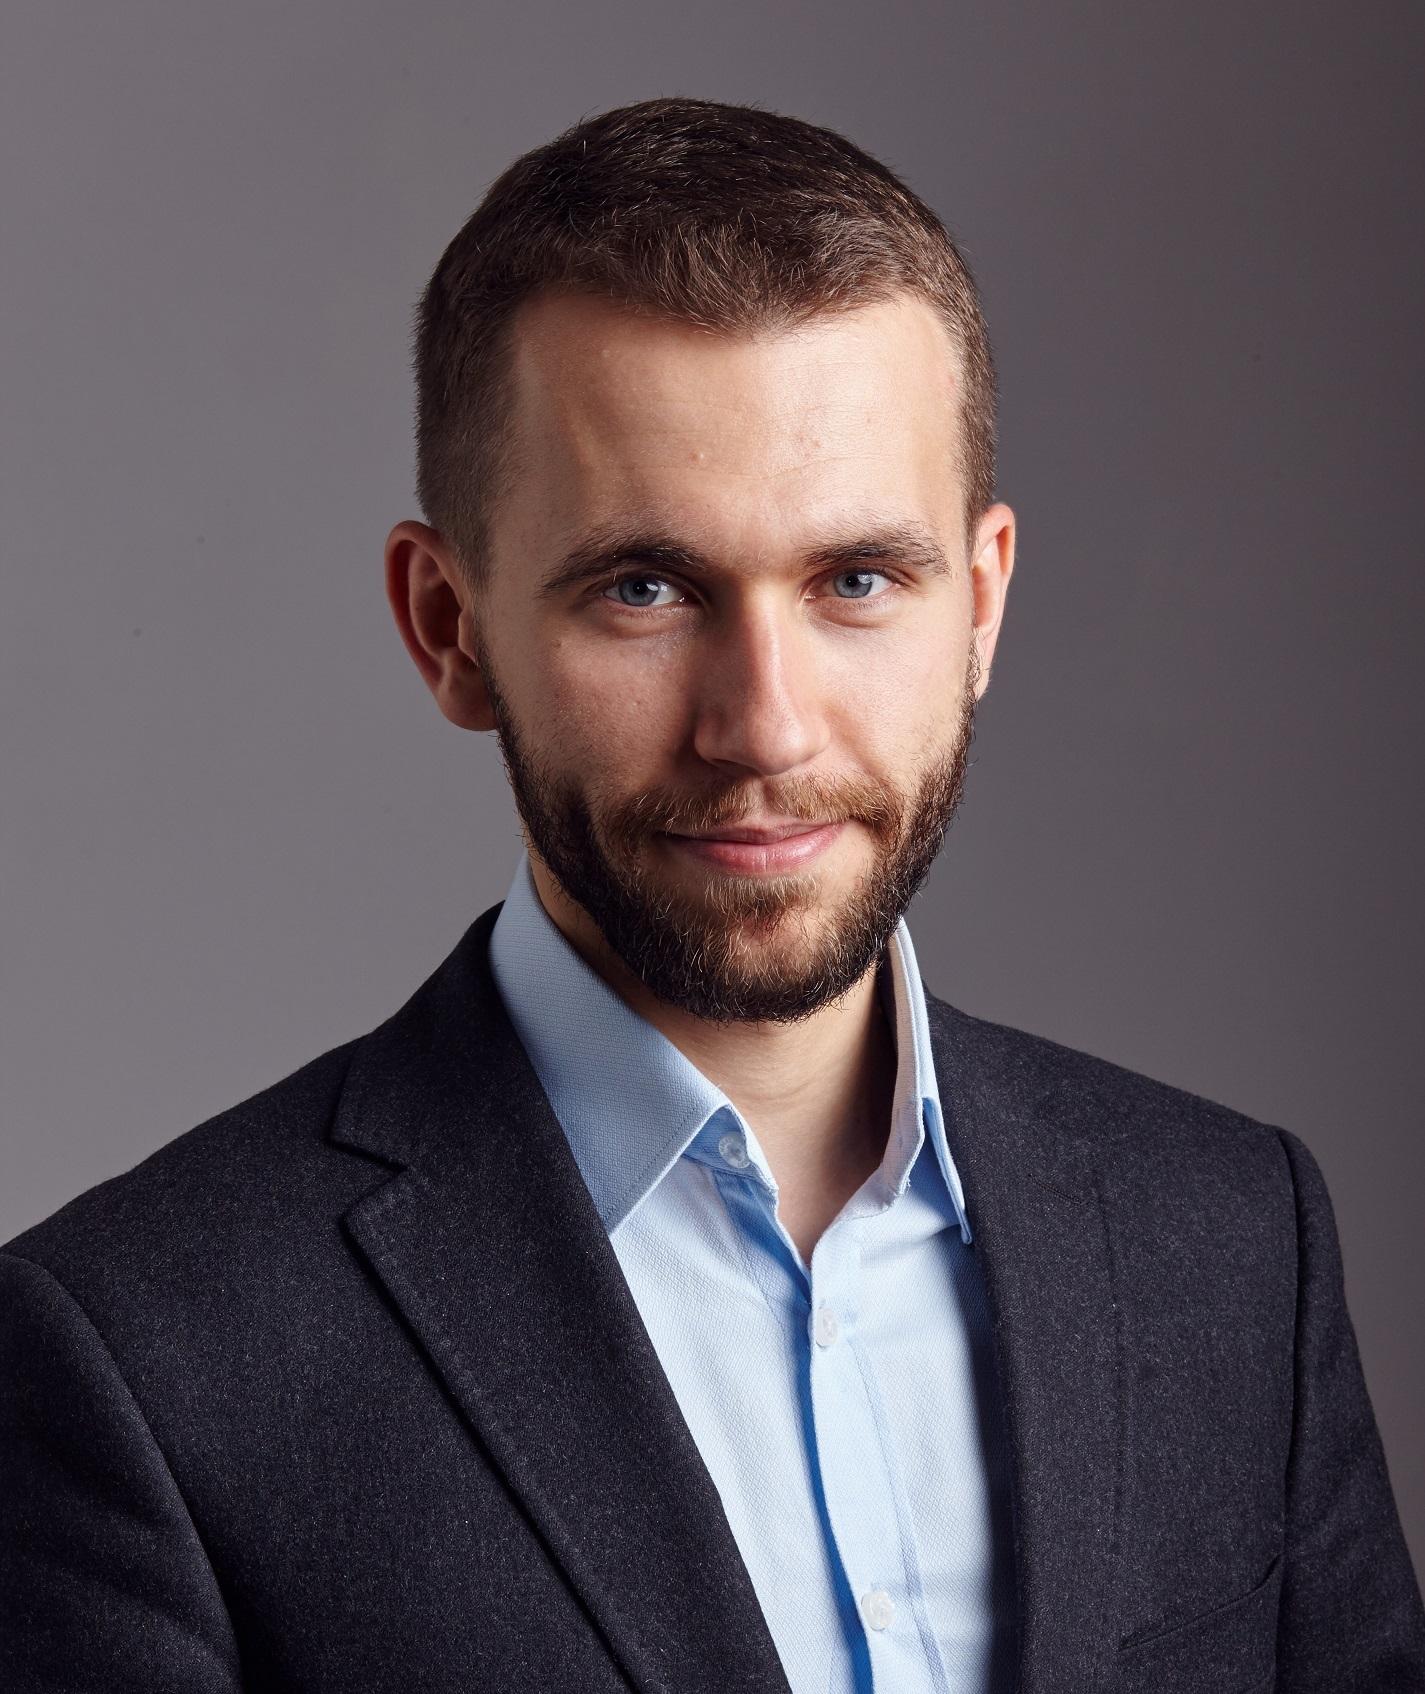 Dominik Jaskulski